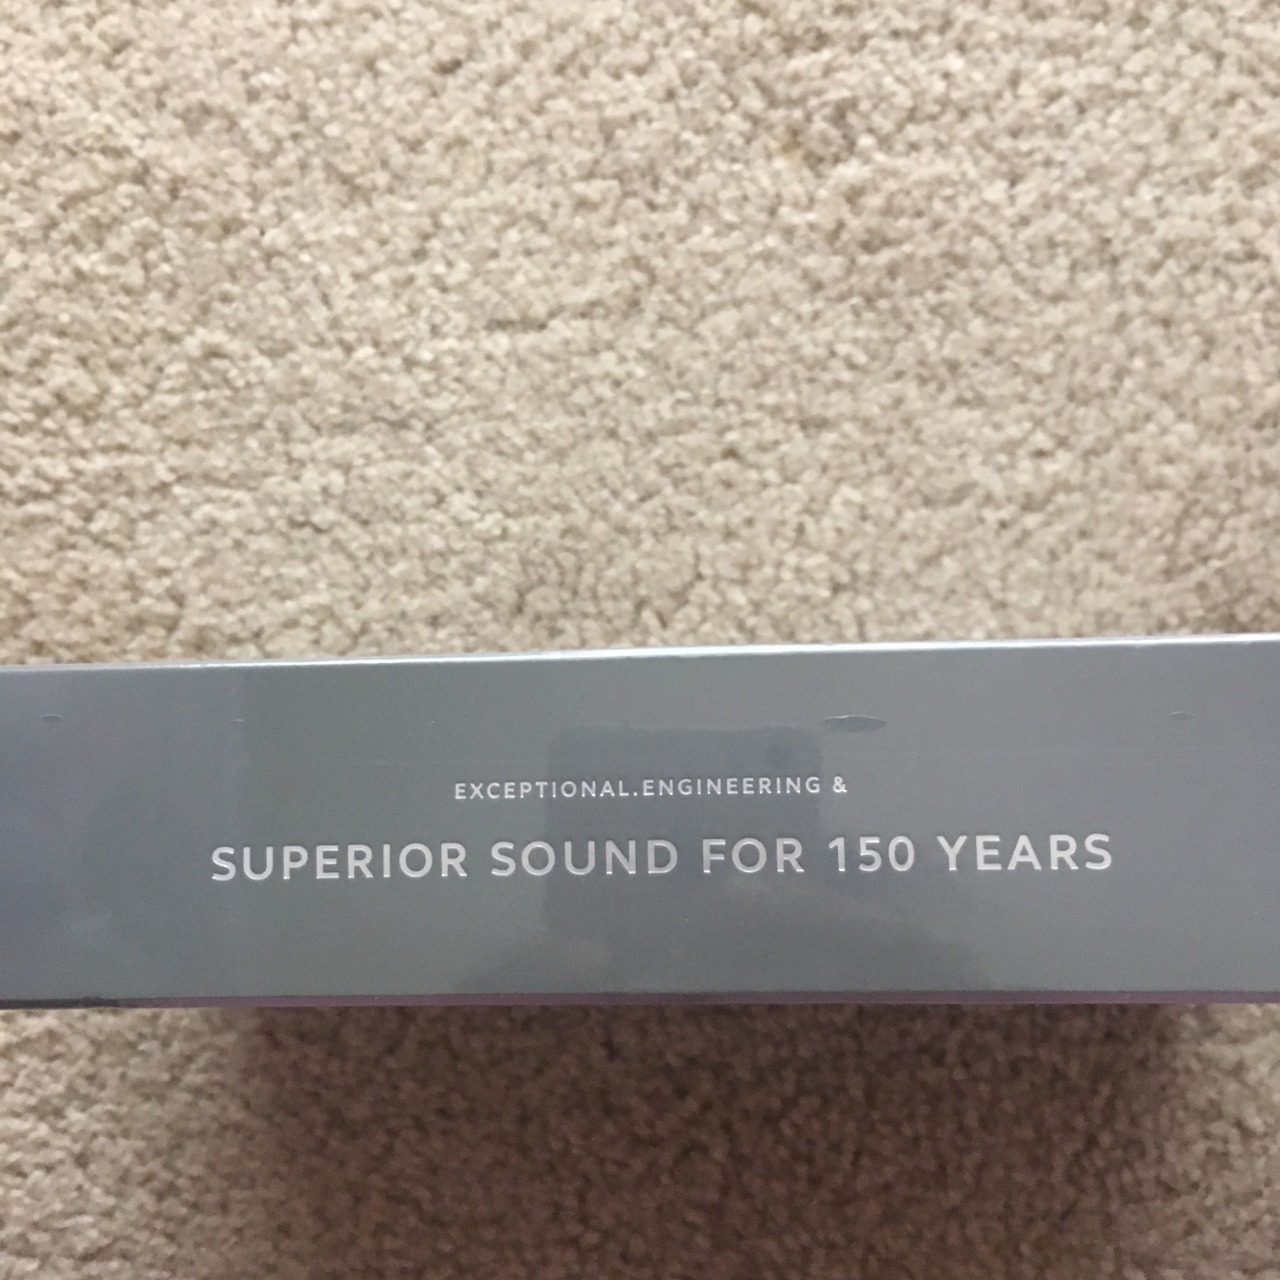 Jabra Elite 75t - Earbuds, BNWOT